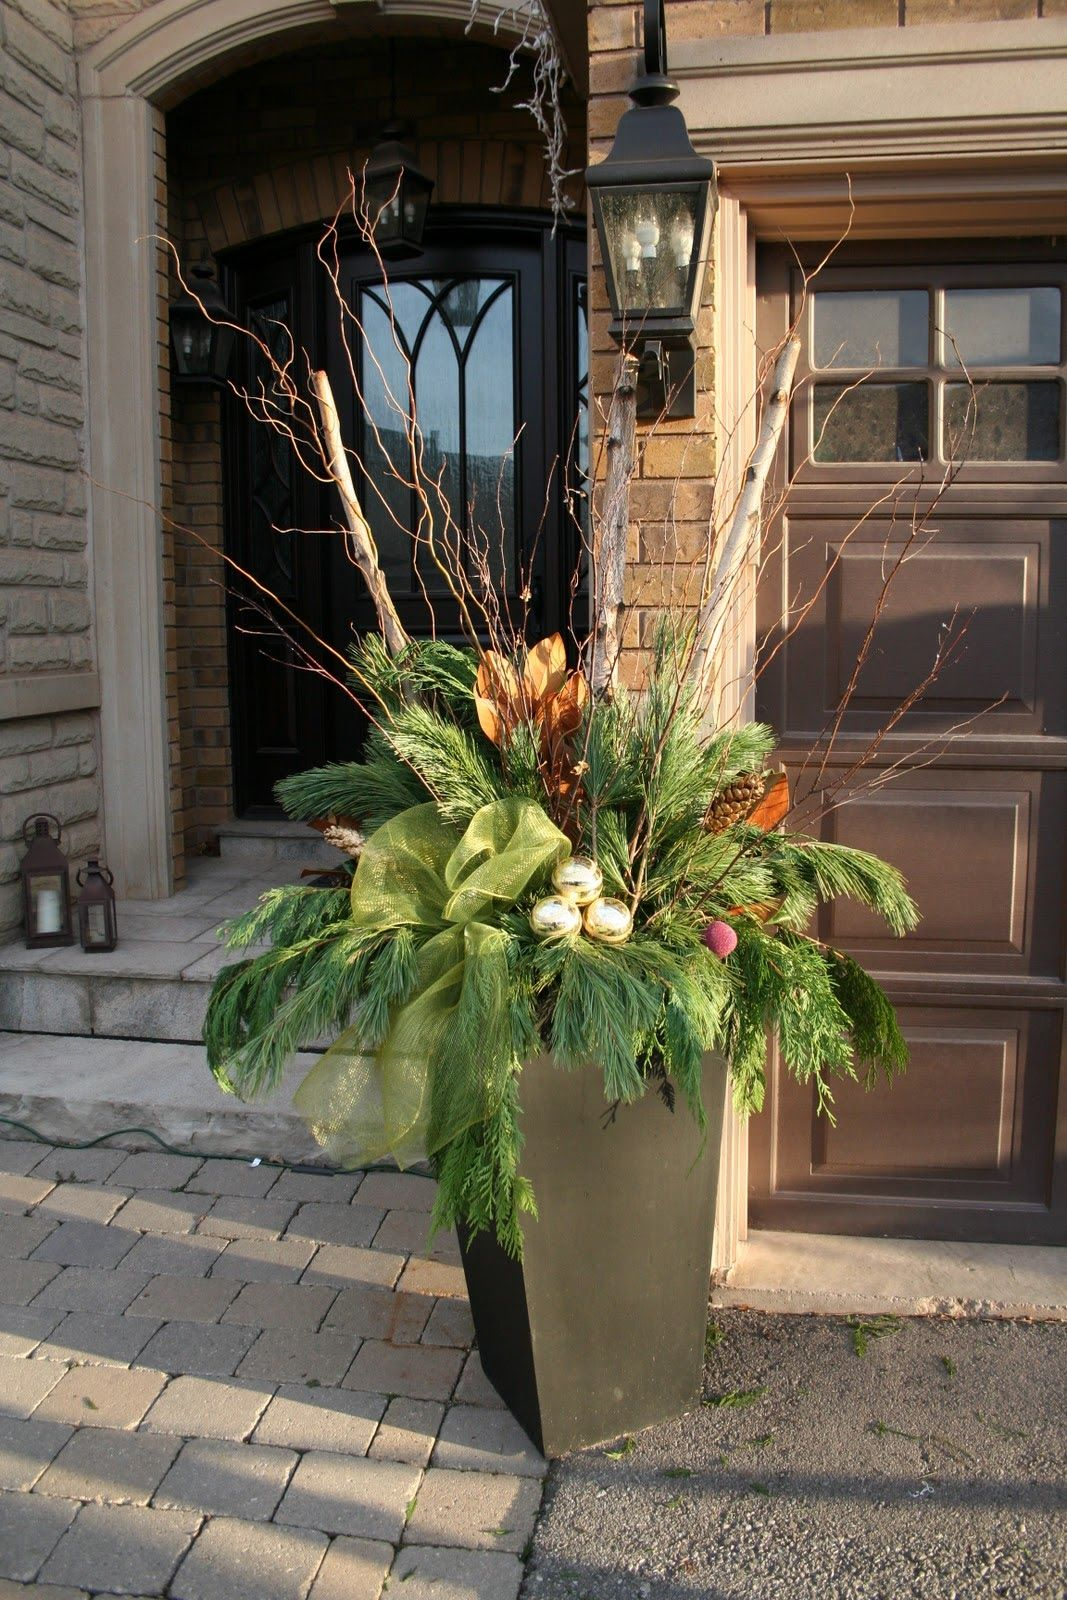 Outdoor garage decorations  christmas planter  Christmas  Pinterest  Christmas planters